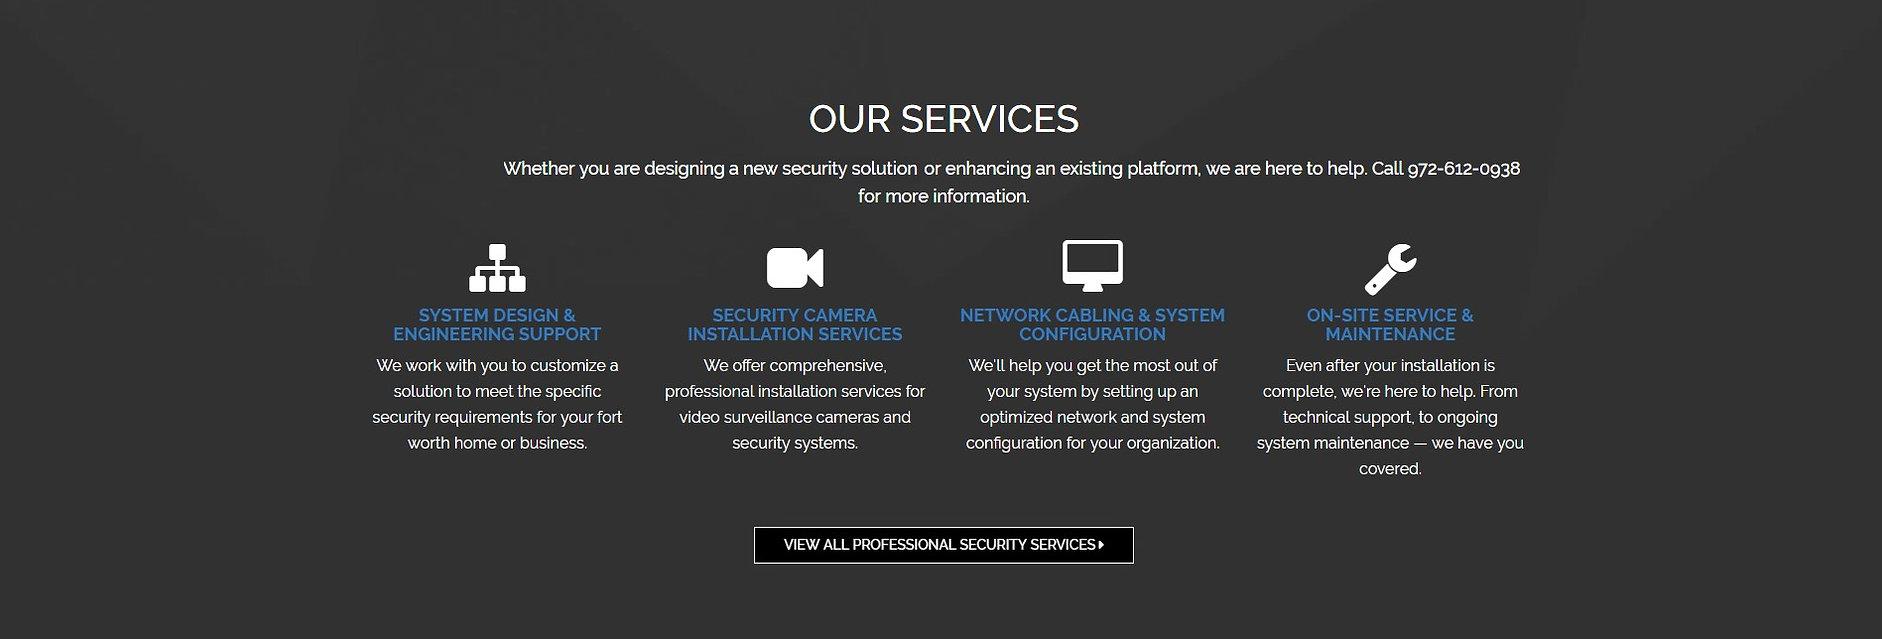 services3.jpg